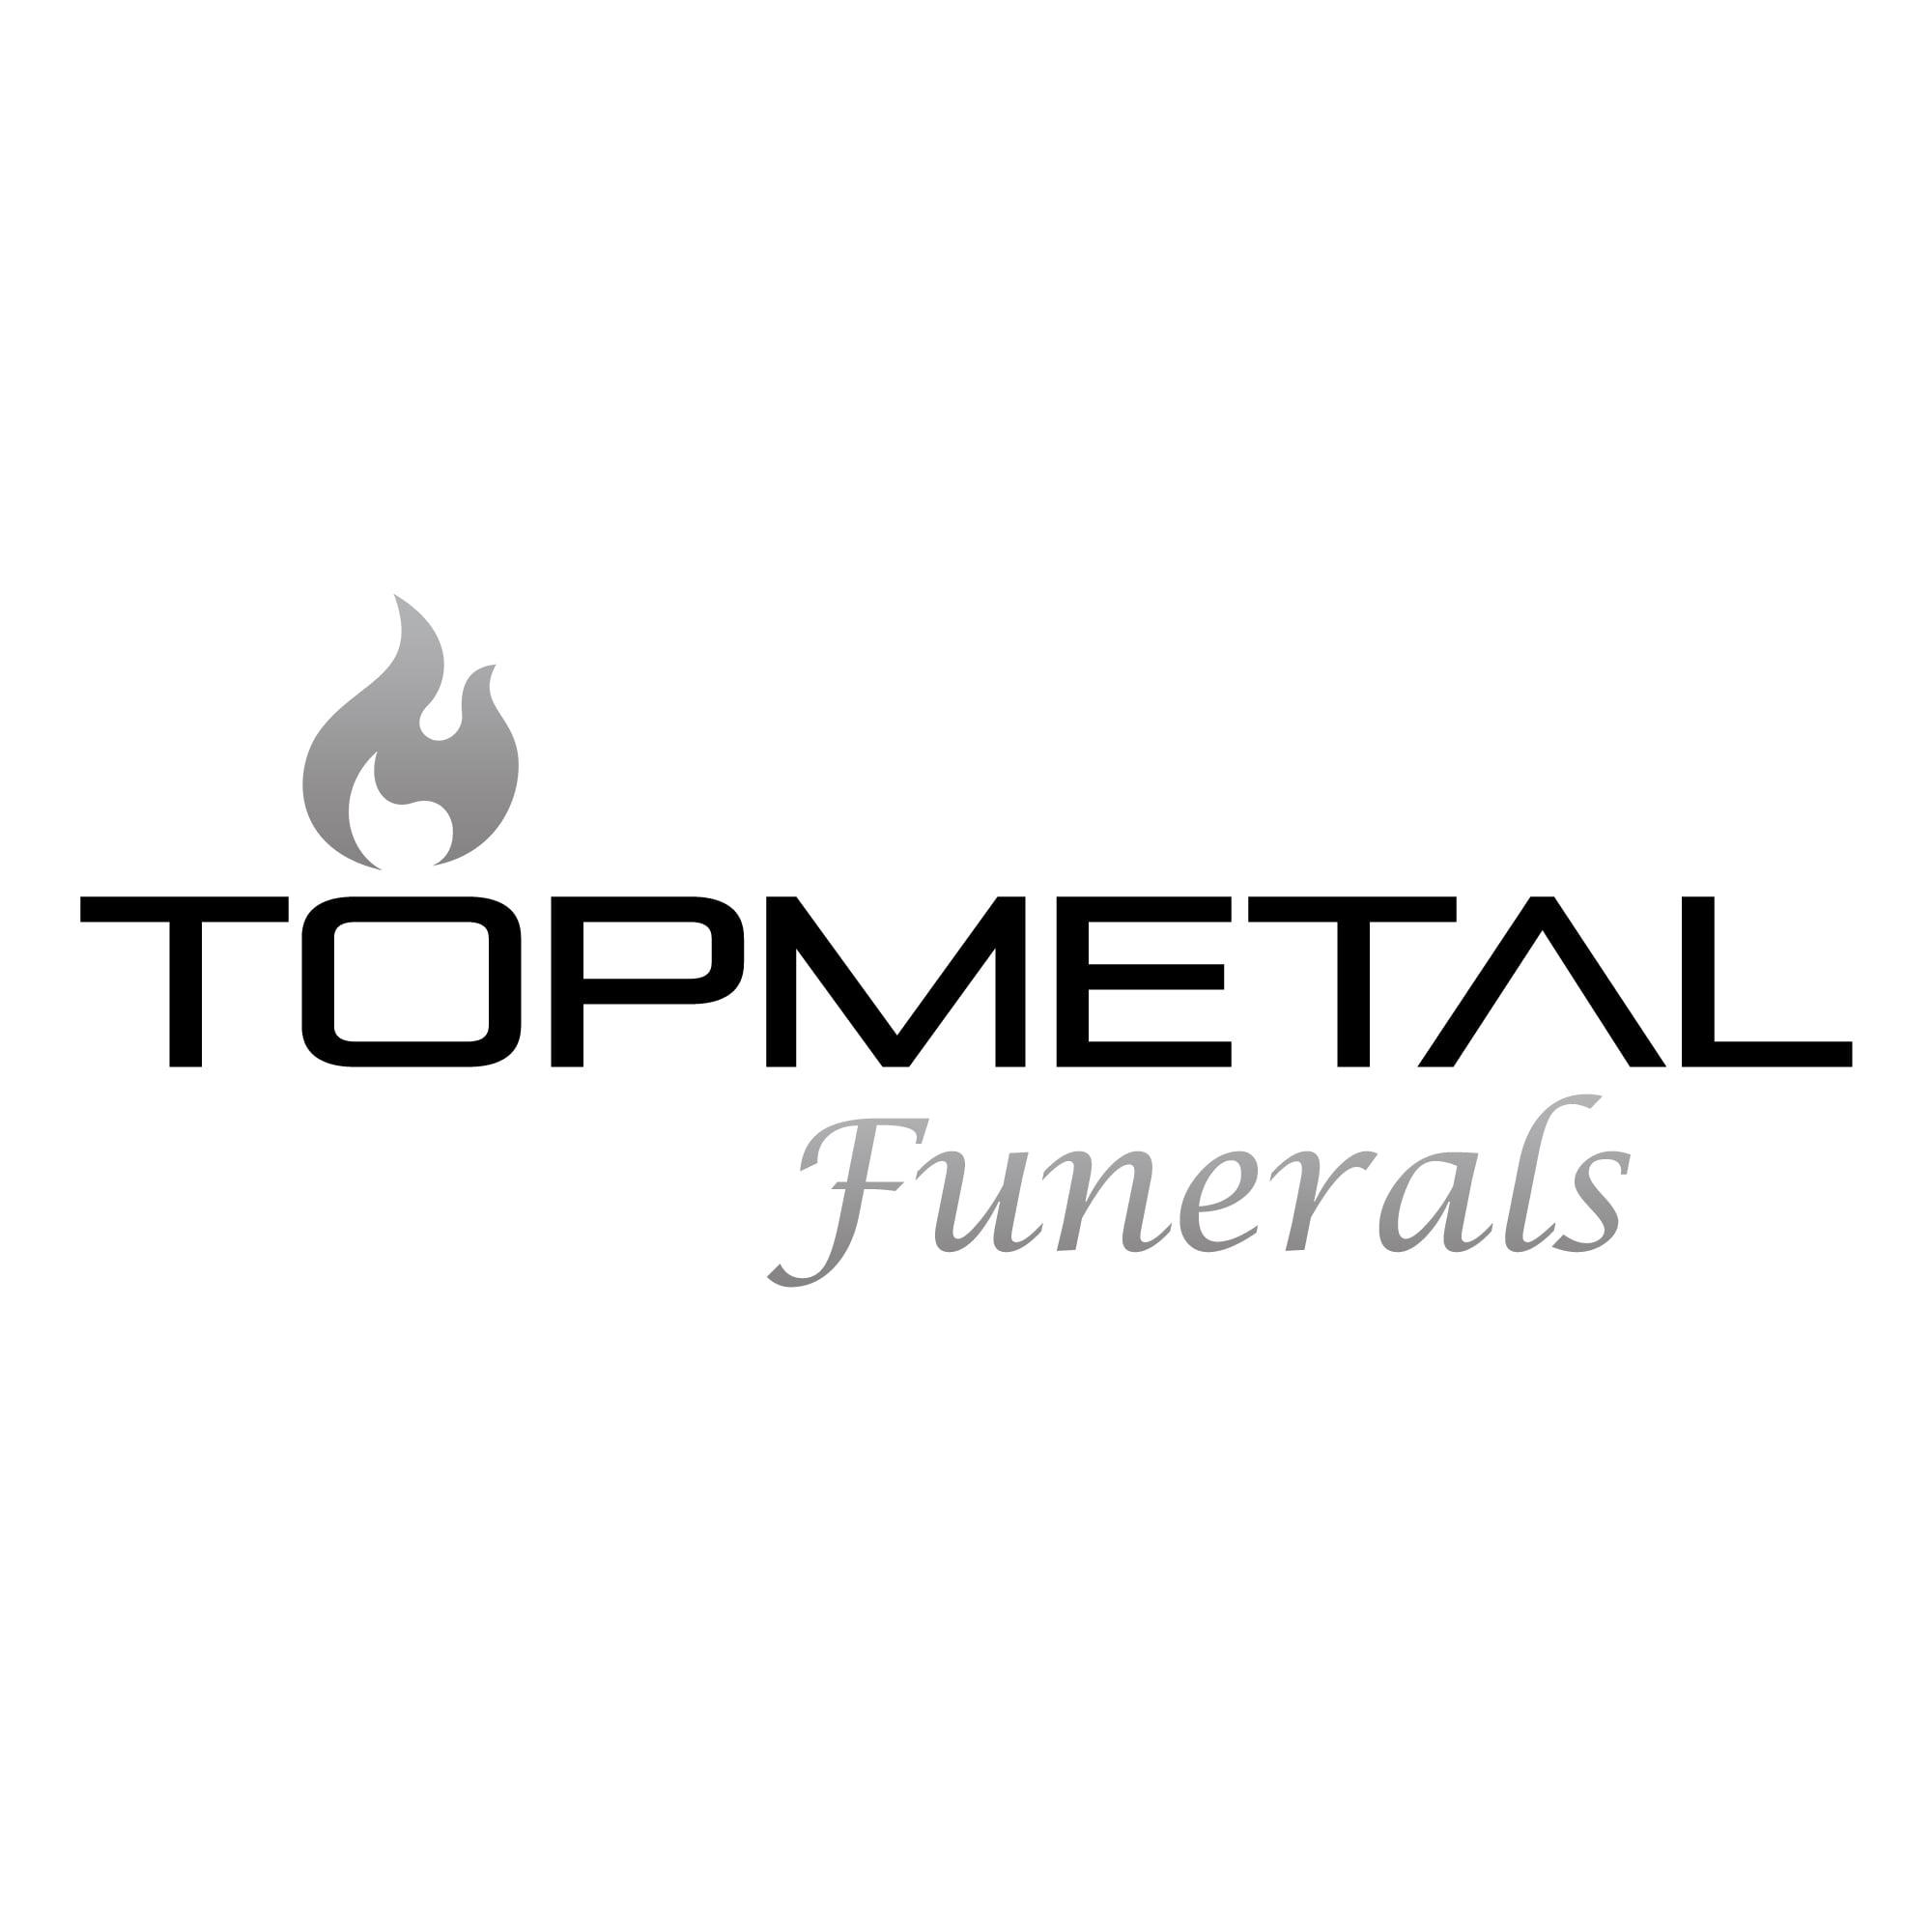 TOPMETAL FUNERALS - ZNICZE I KATAFALKI